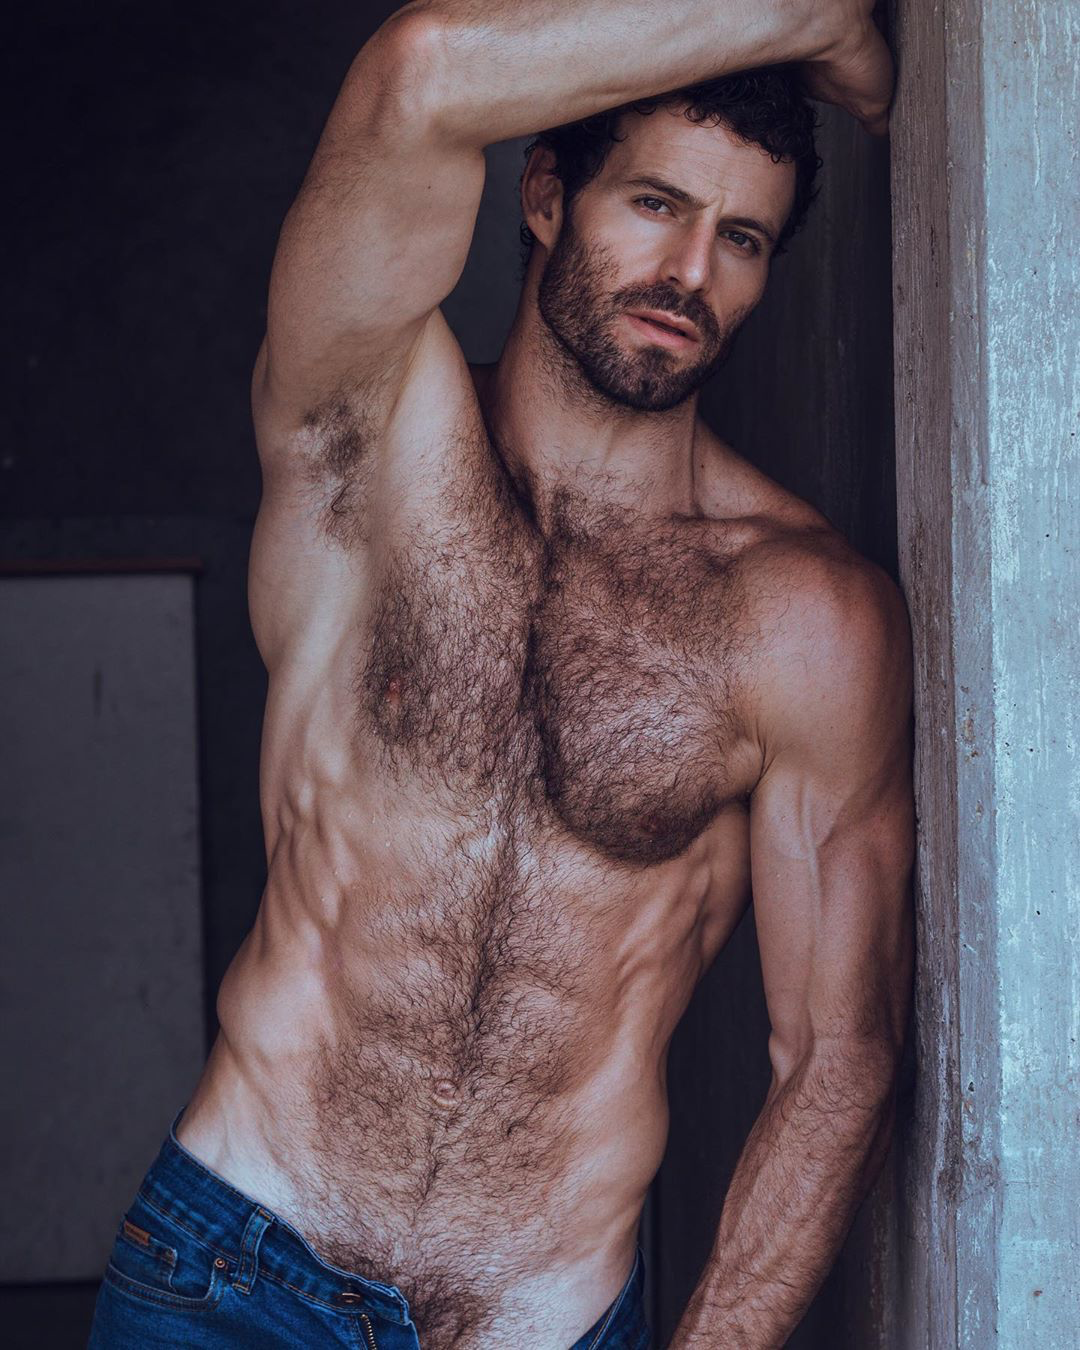 Pin on Hot & Hairy Men